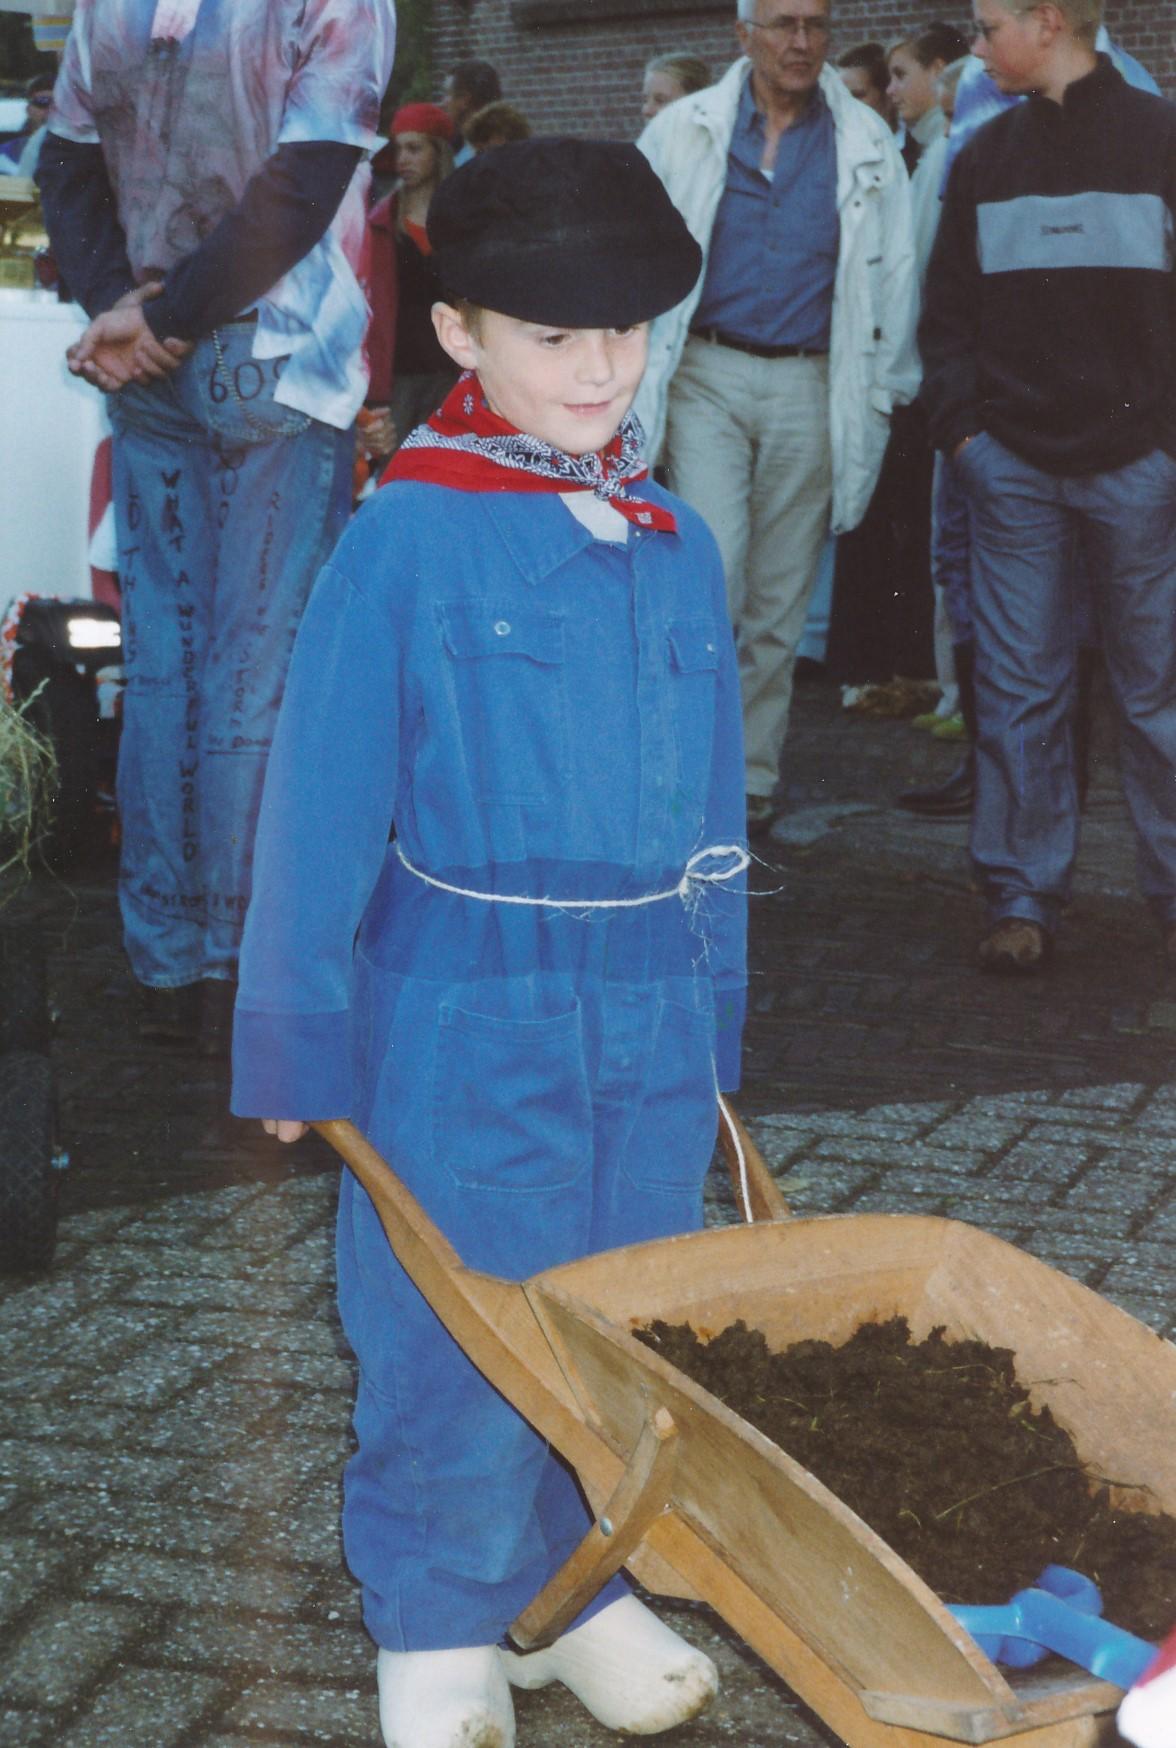 Fotoalbum Anneke Miedema, 017, Optocht Floris Miedema, Merke 2002